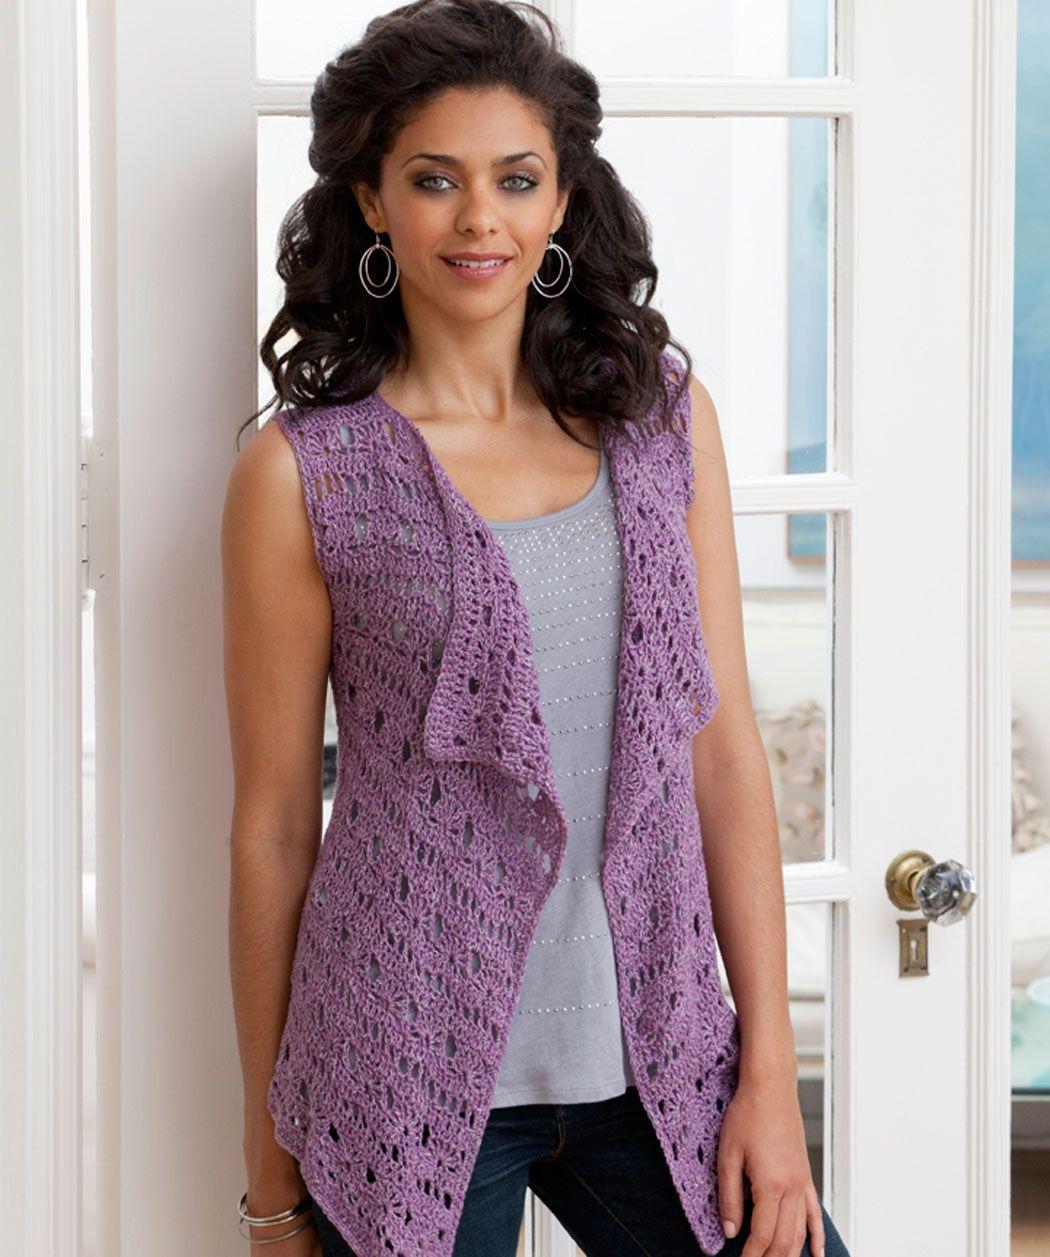 Vest Knitting Pattern Beginners : Free crochet vest patterns for beginners drapey